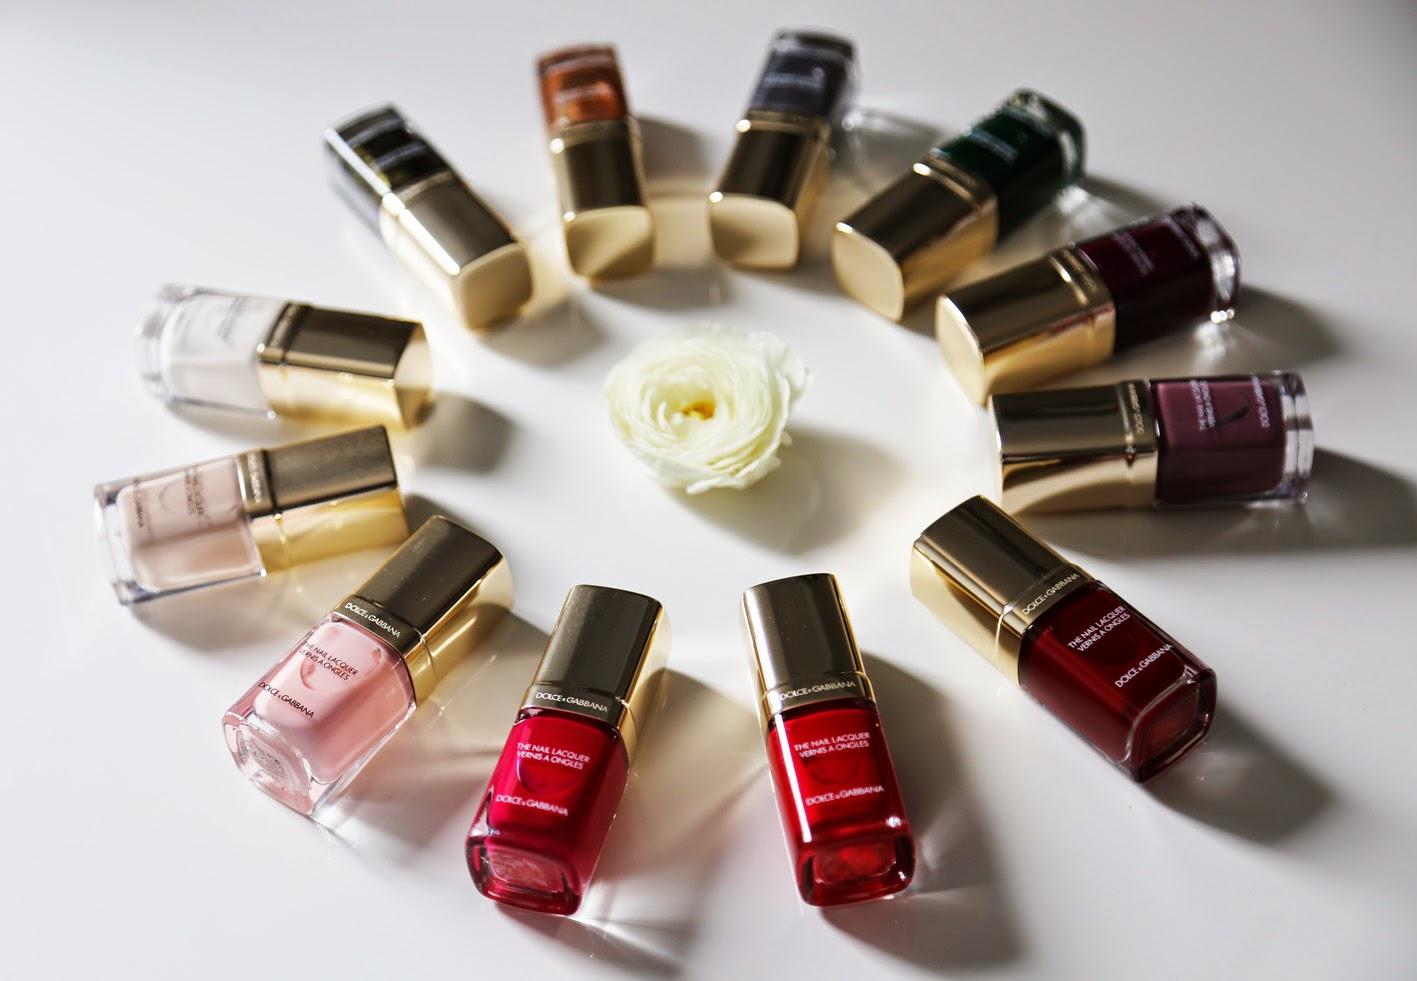 Dolce&Gabbana Make Up Dolce lacas de uñas